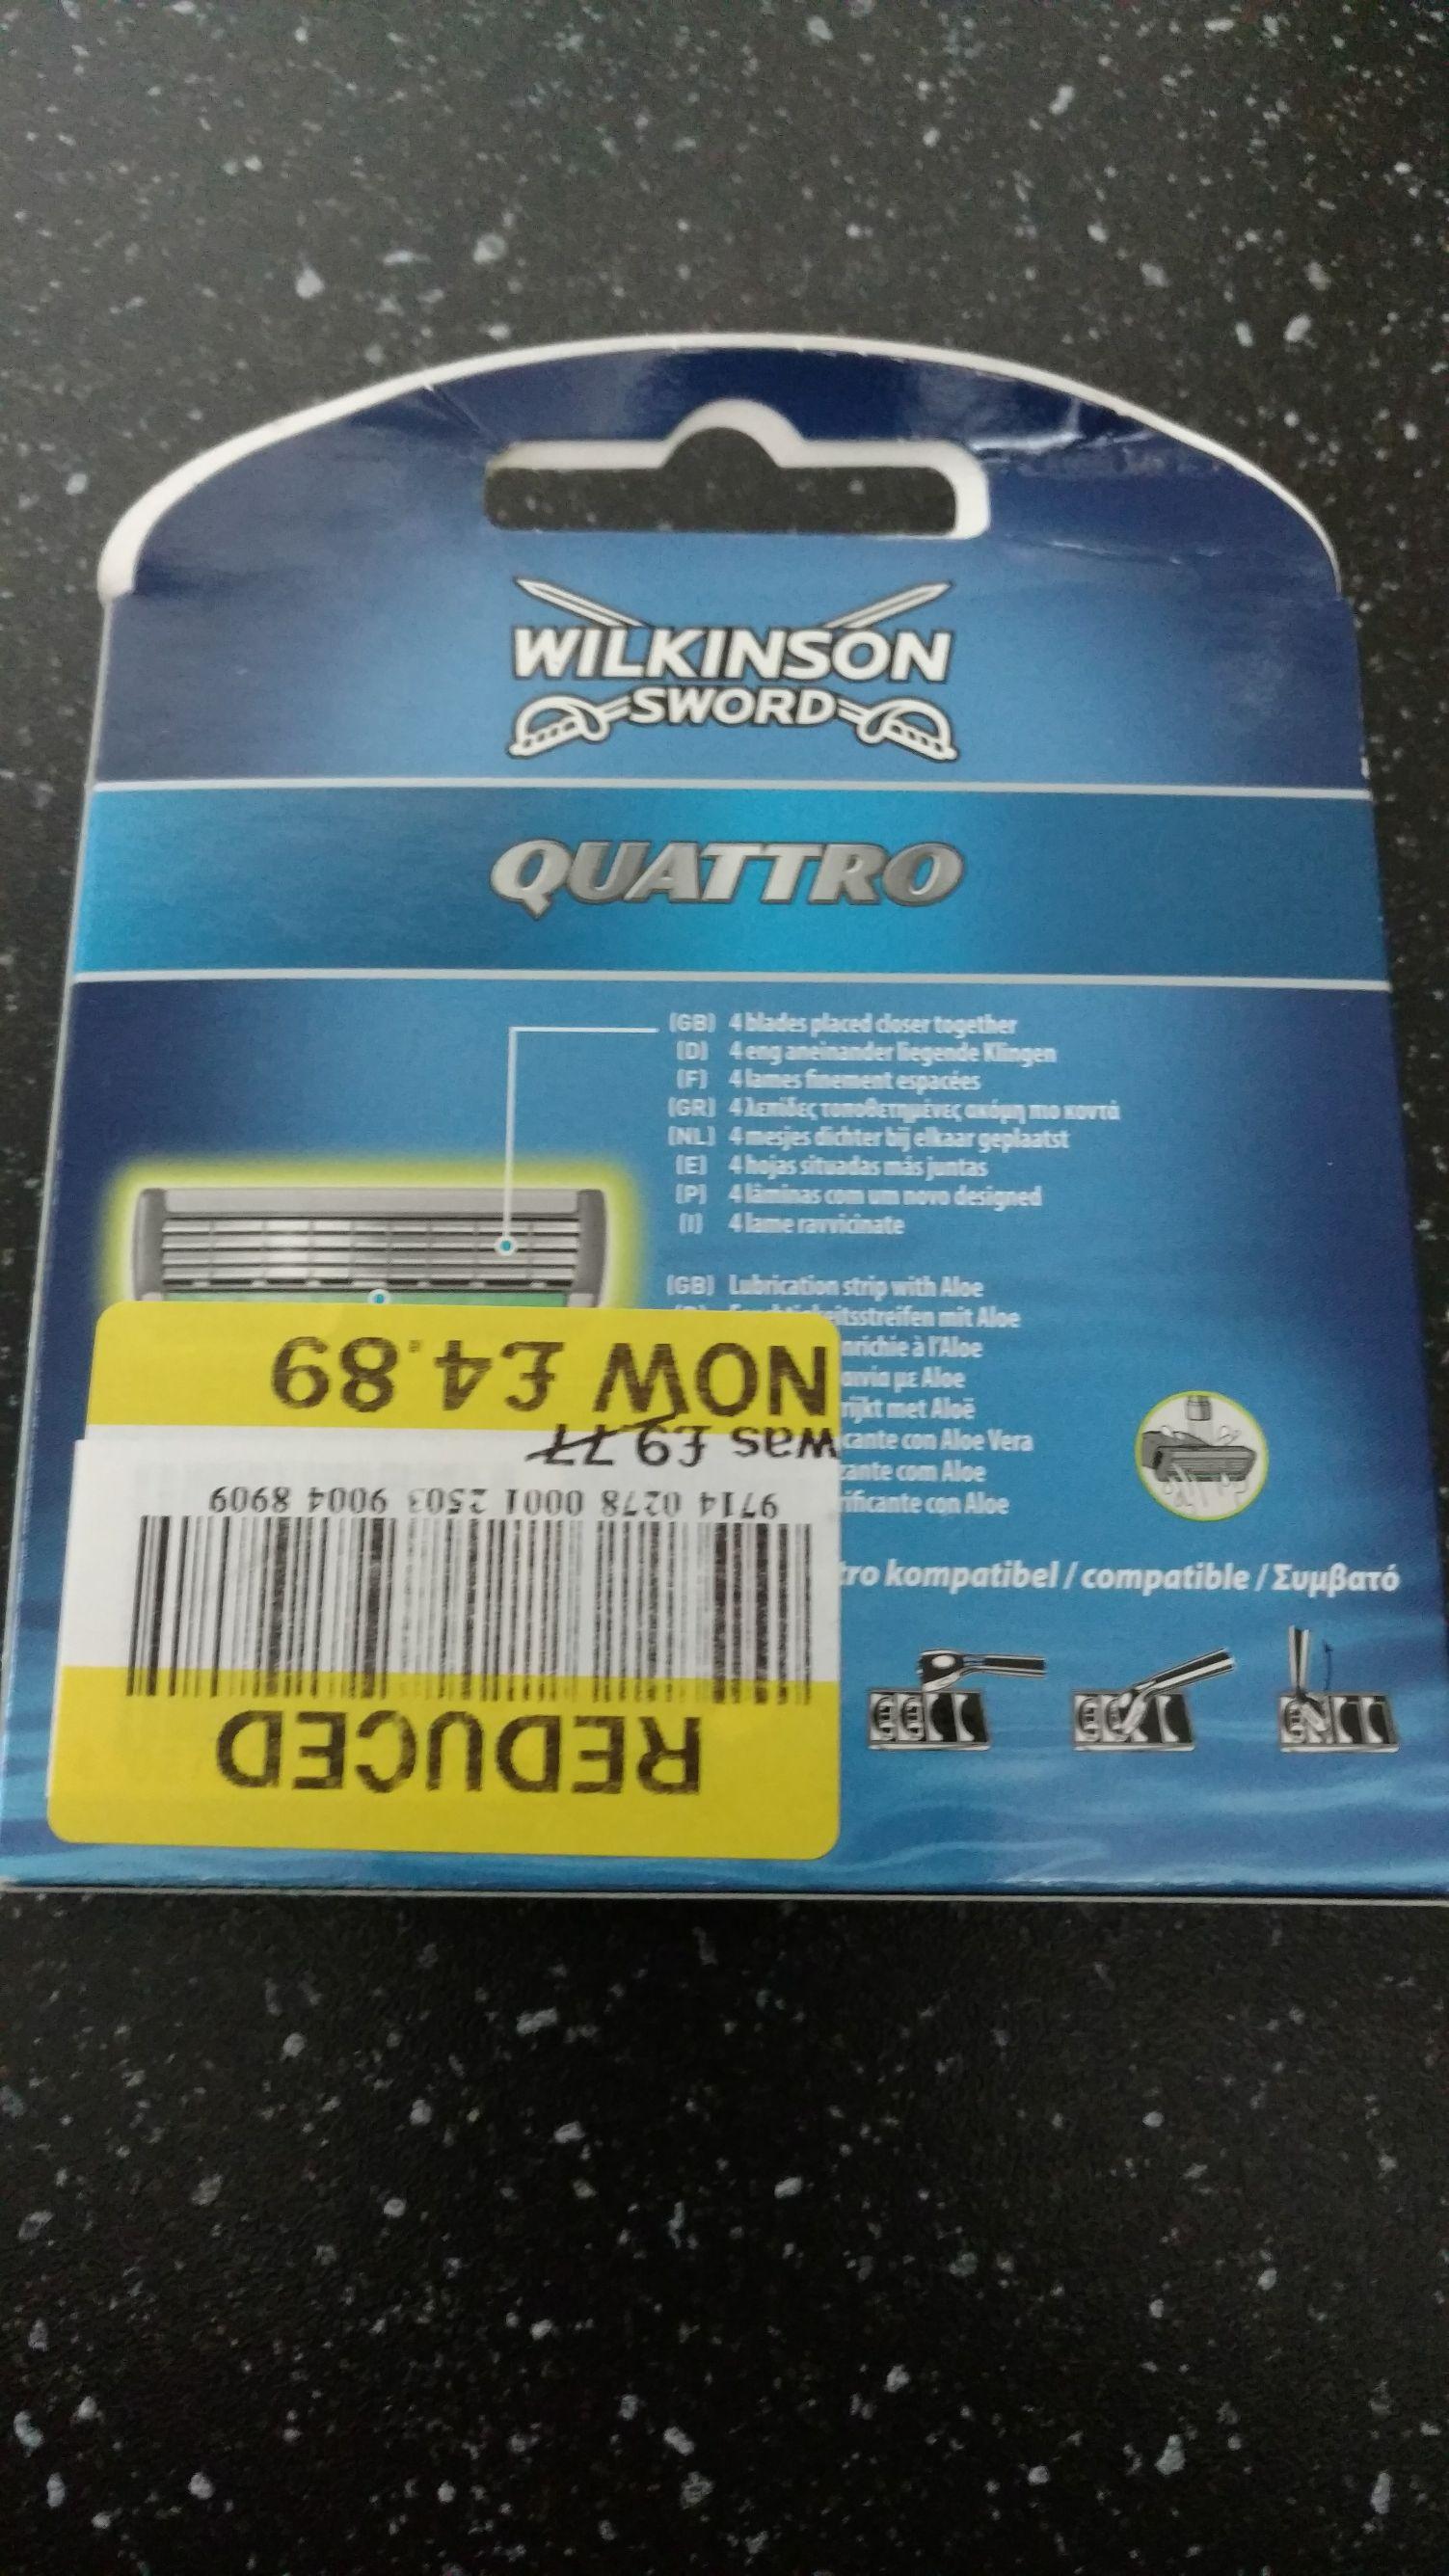 Wilkinson Sword Quattro x 8 £4.89 @ Tesco - Widnes